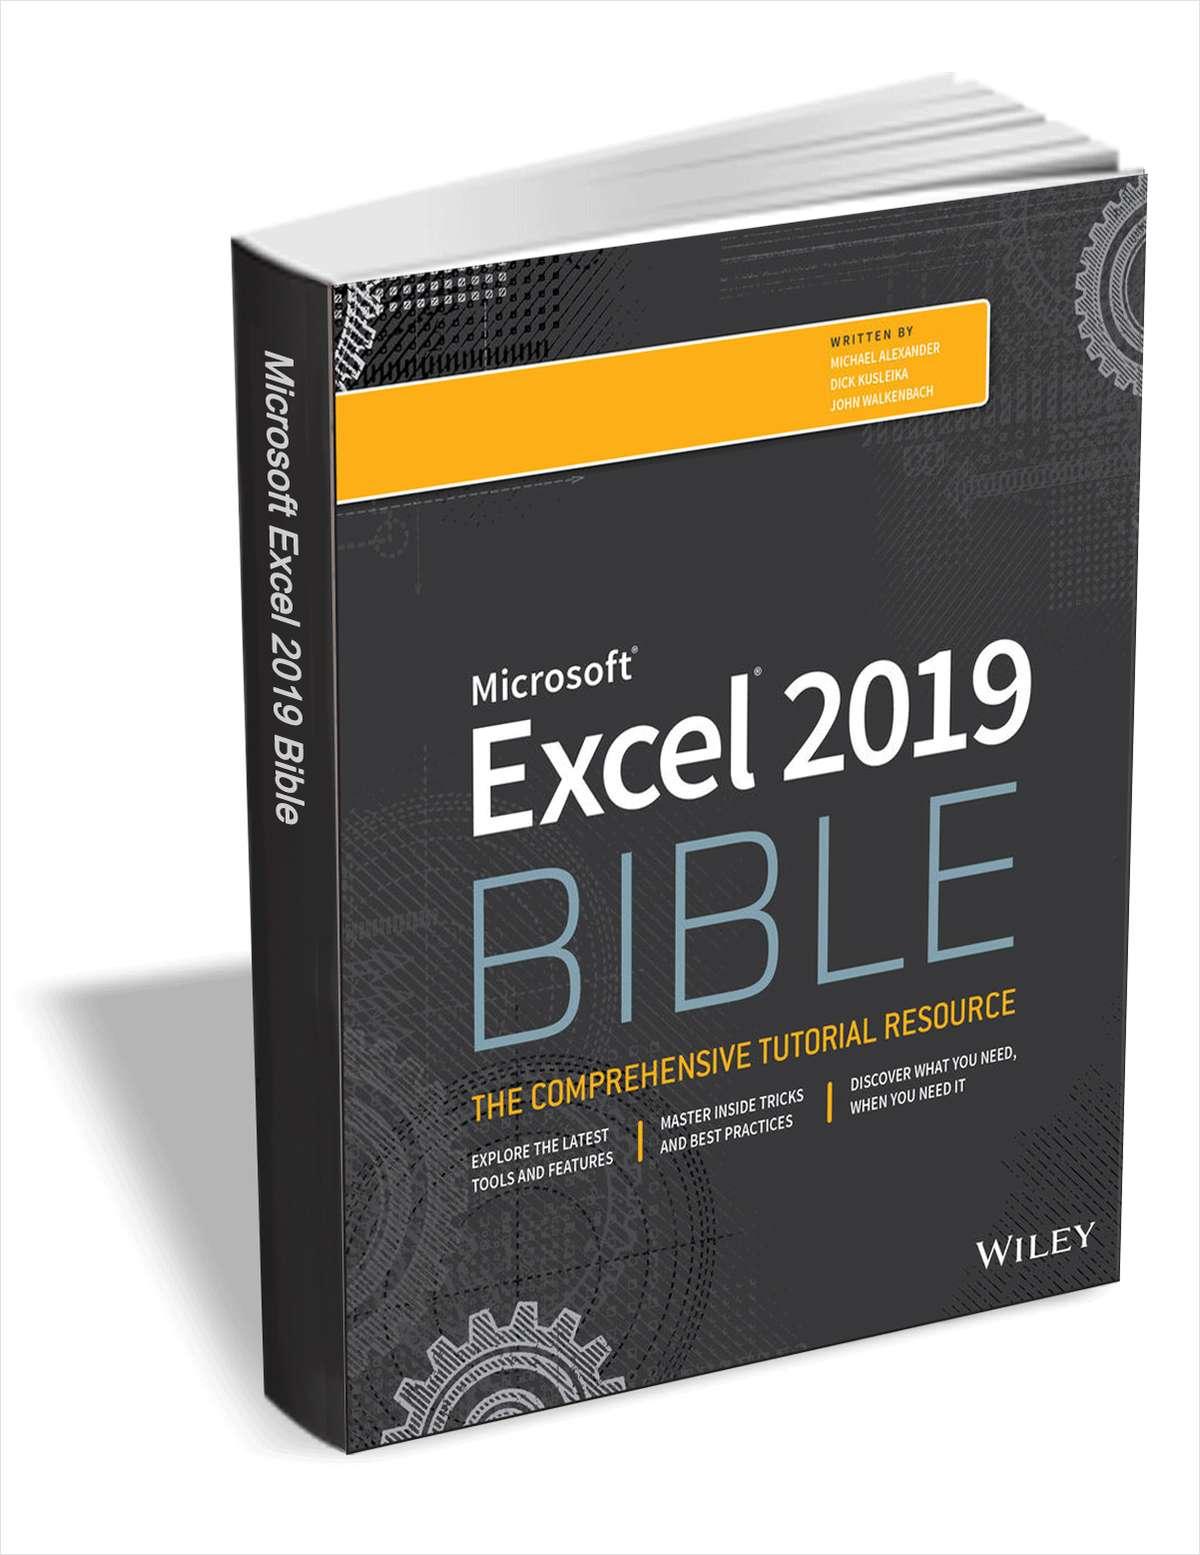 [TheHackerNews] Excel 2019 Bible kostenlos